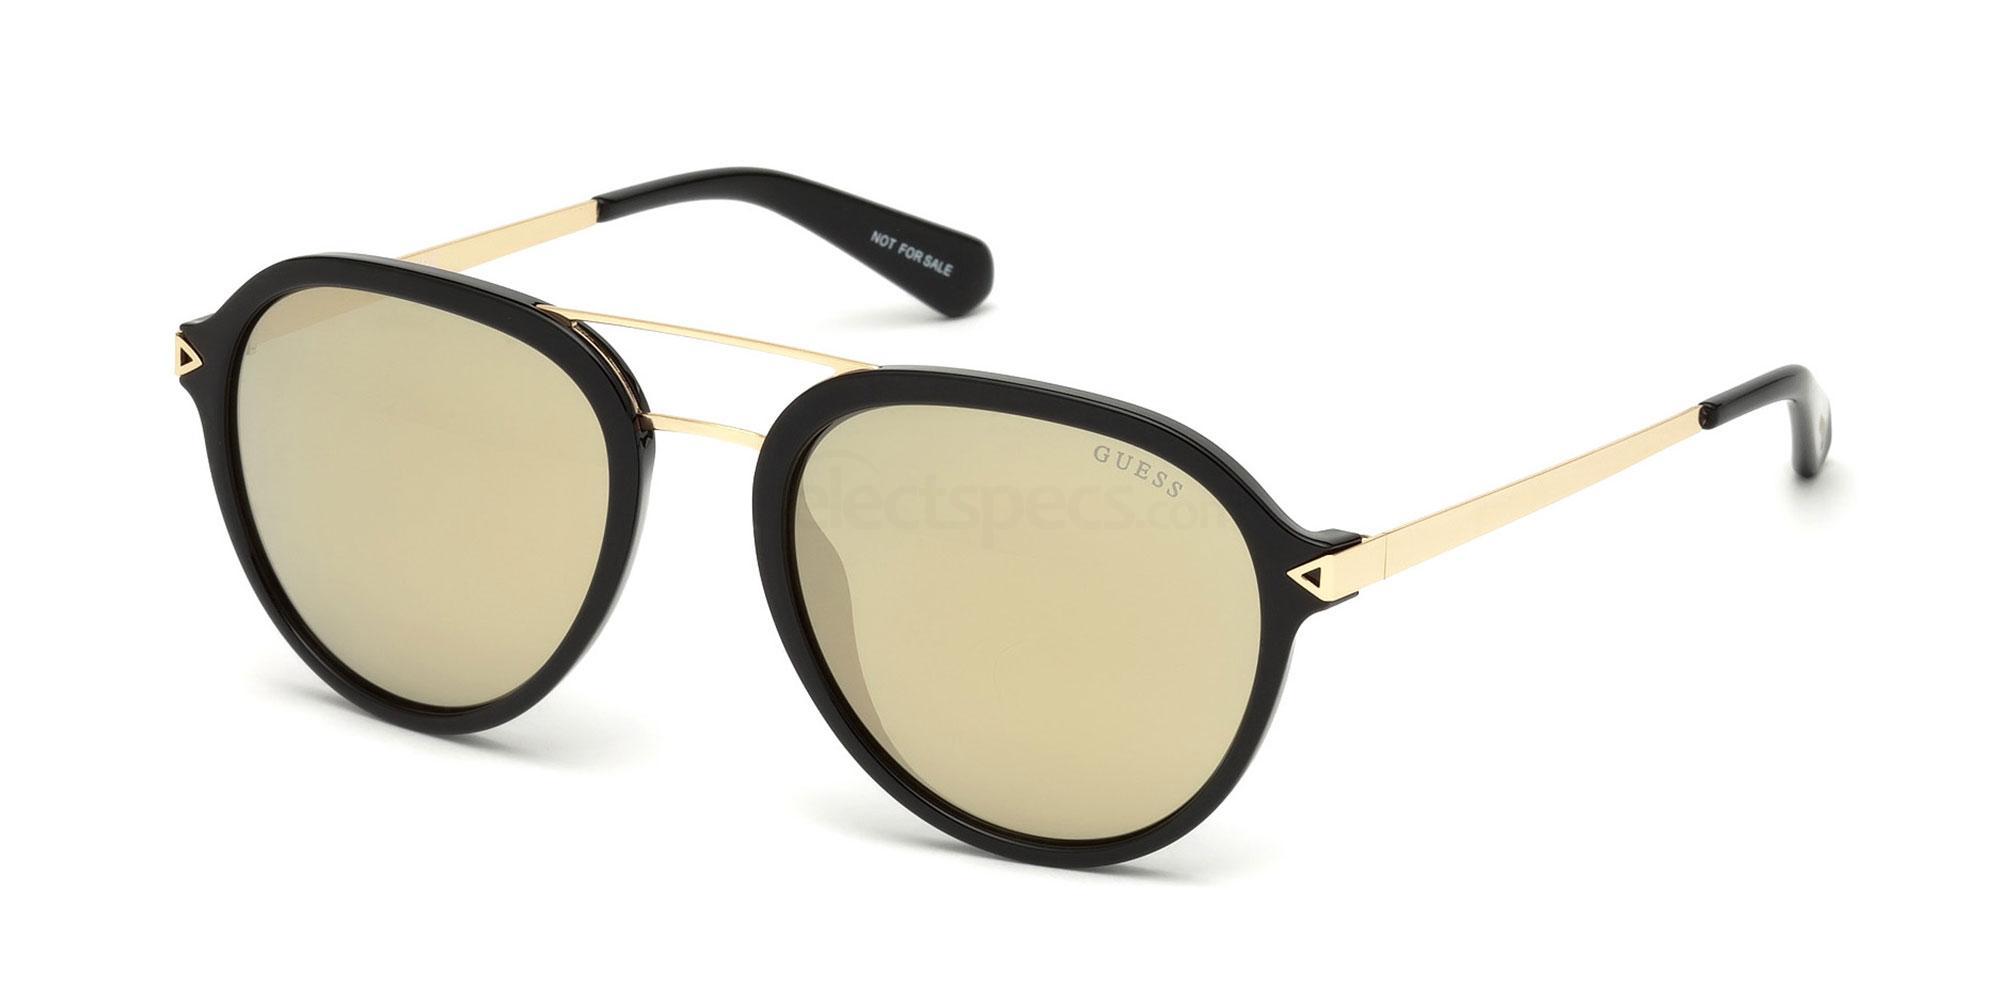 01G GU6924 Sunglasses, Guess